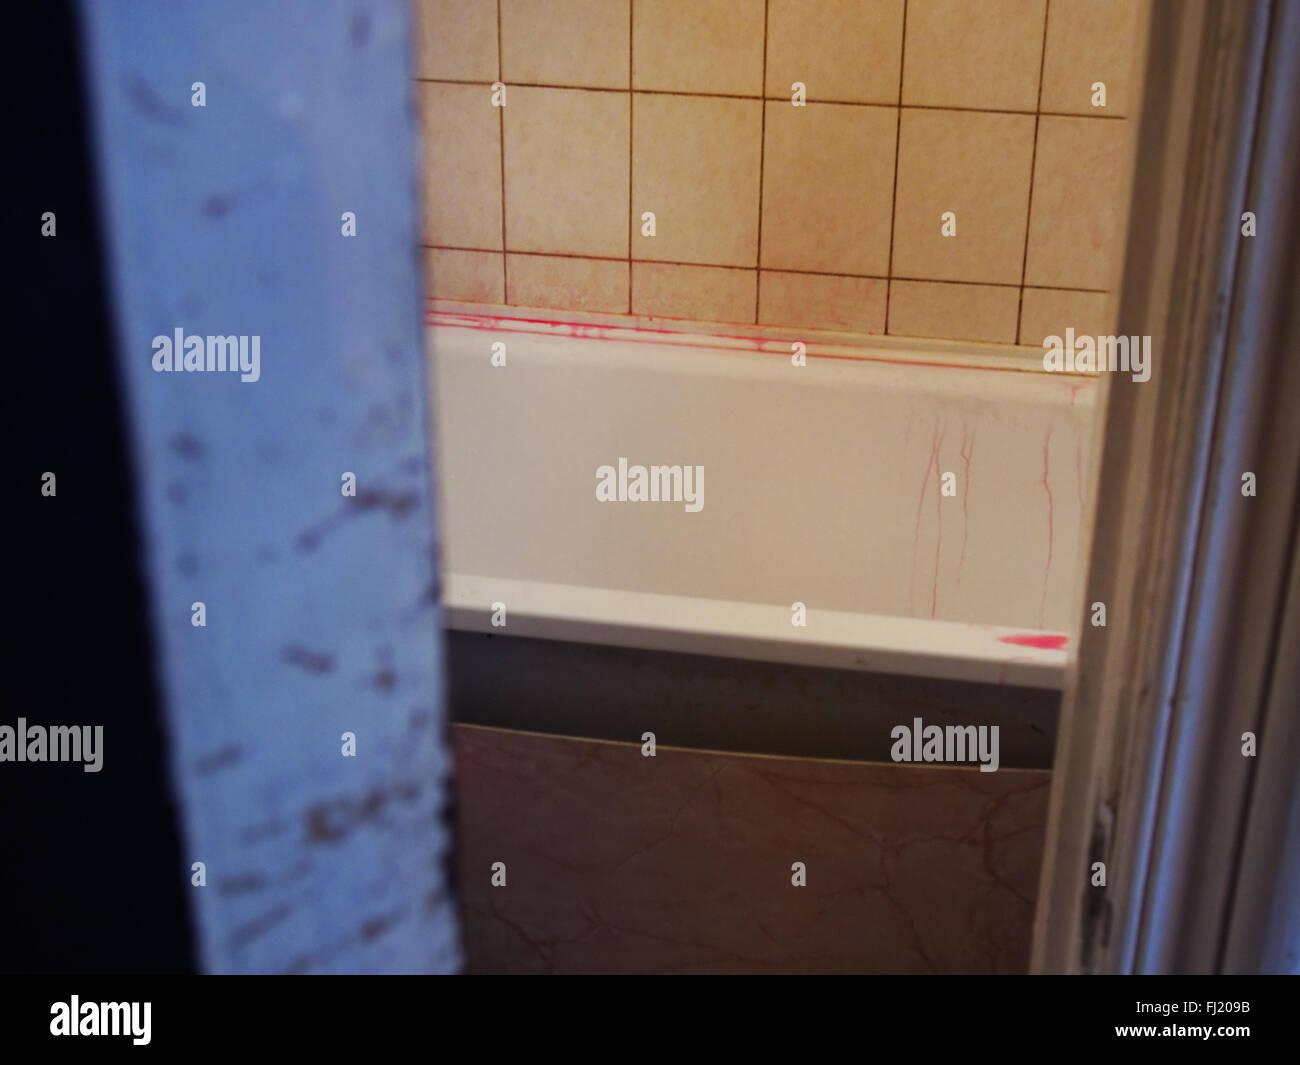 The bathroom in through the door. Tub, like in streaks of blood - Stock Image